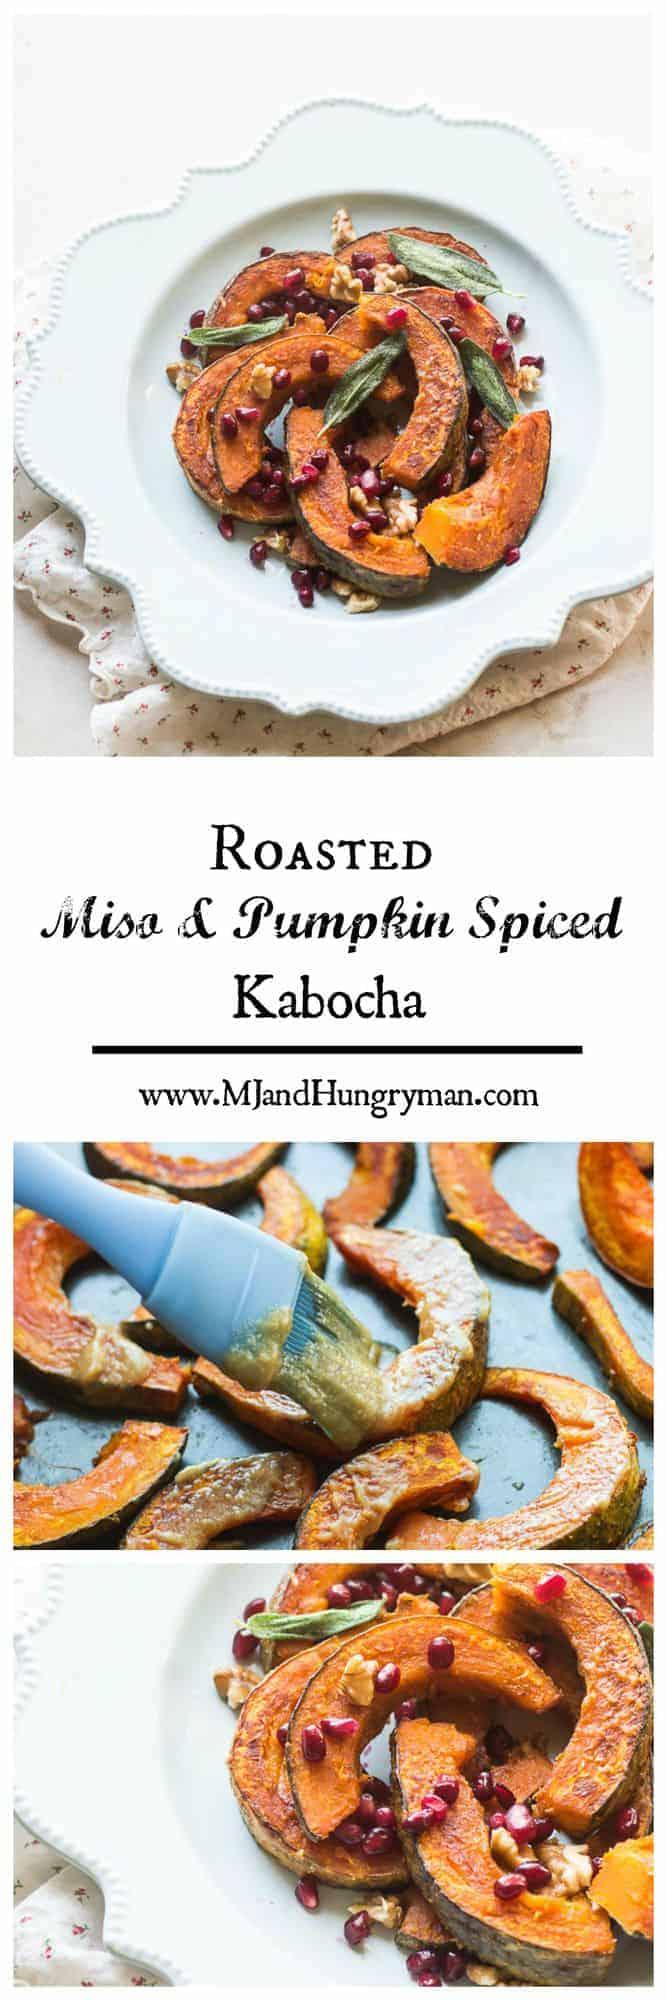 Roasted miso and pumpkin spiced Kabocha